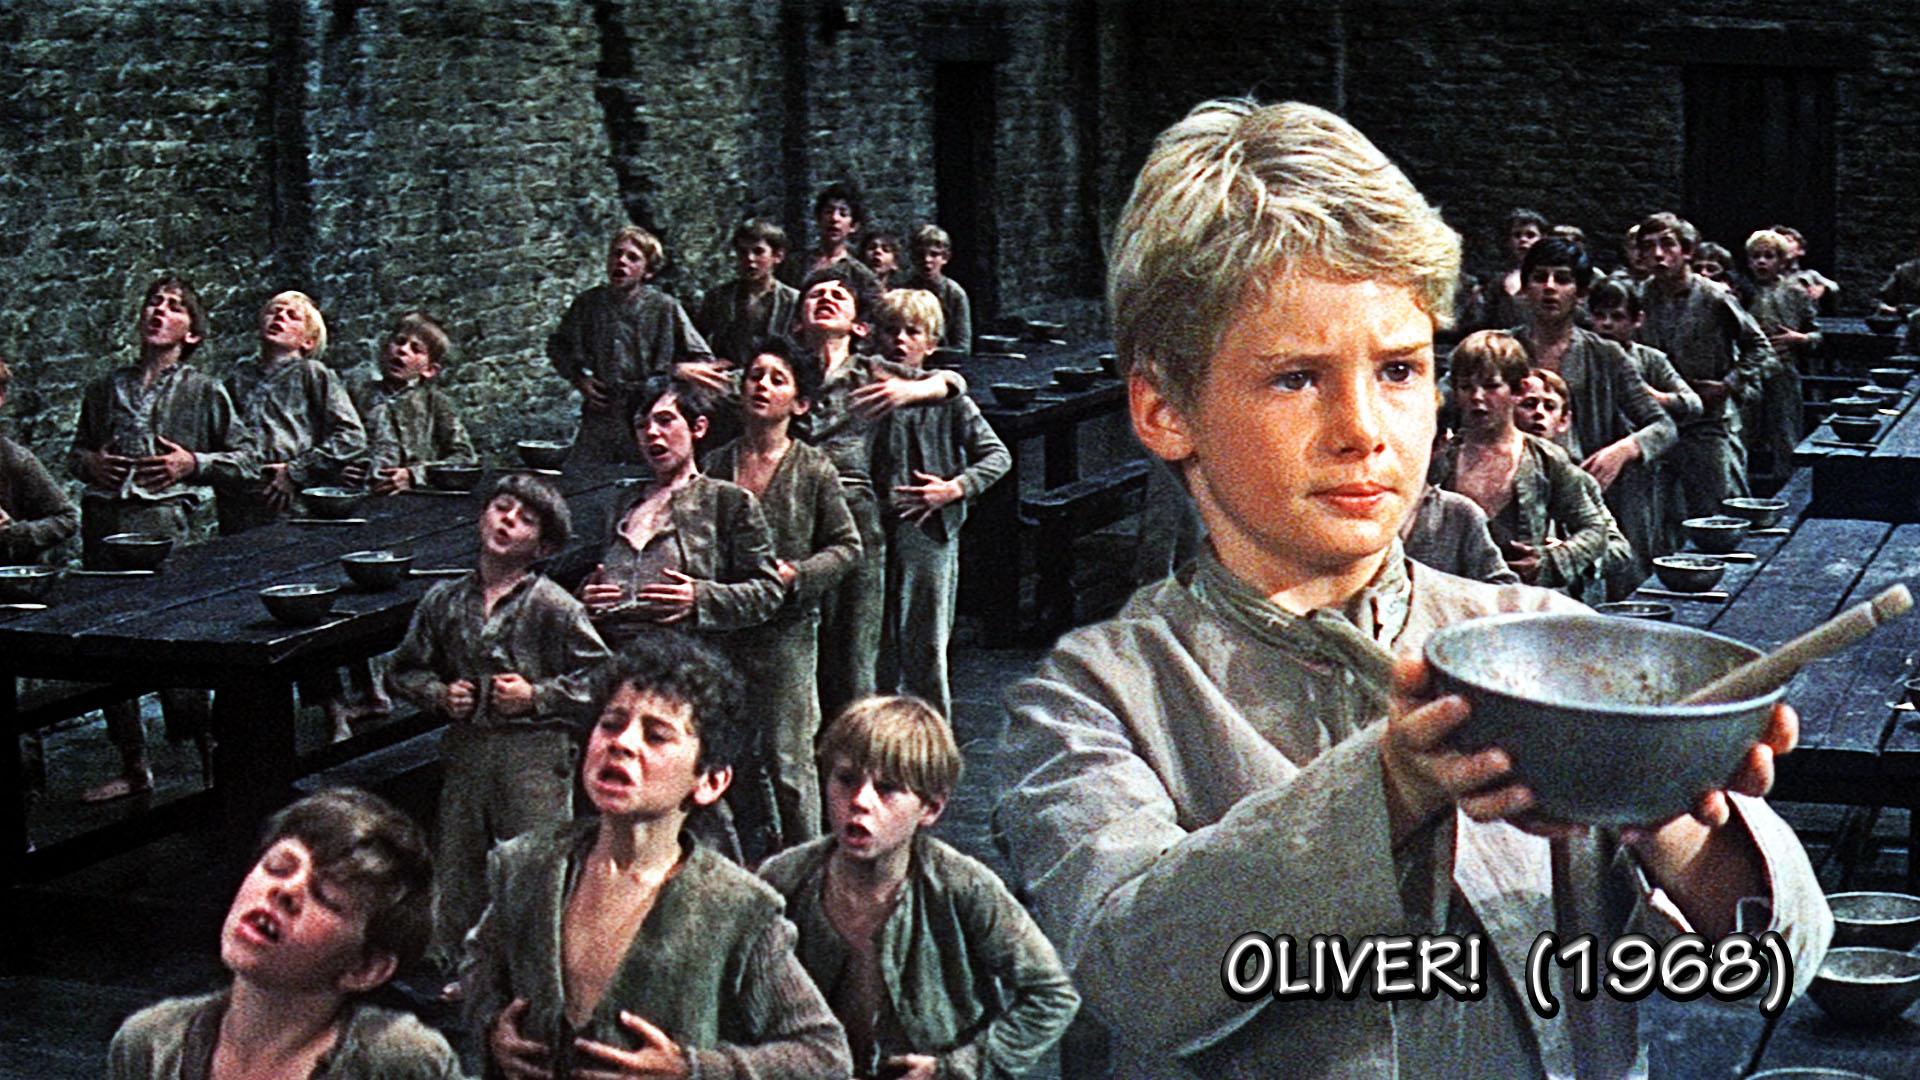 Oliver 1968 Movie 1920x1080